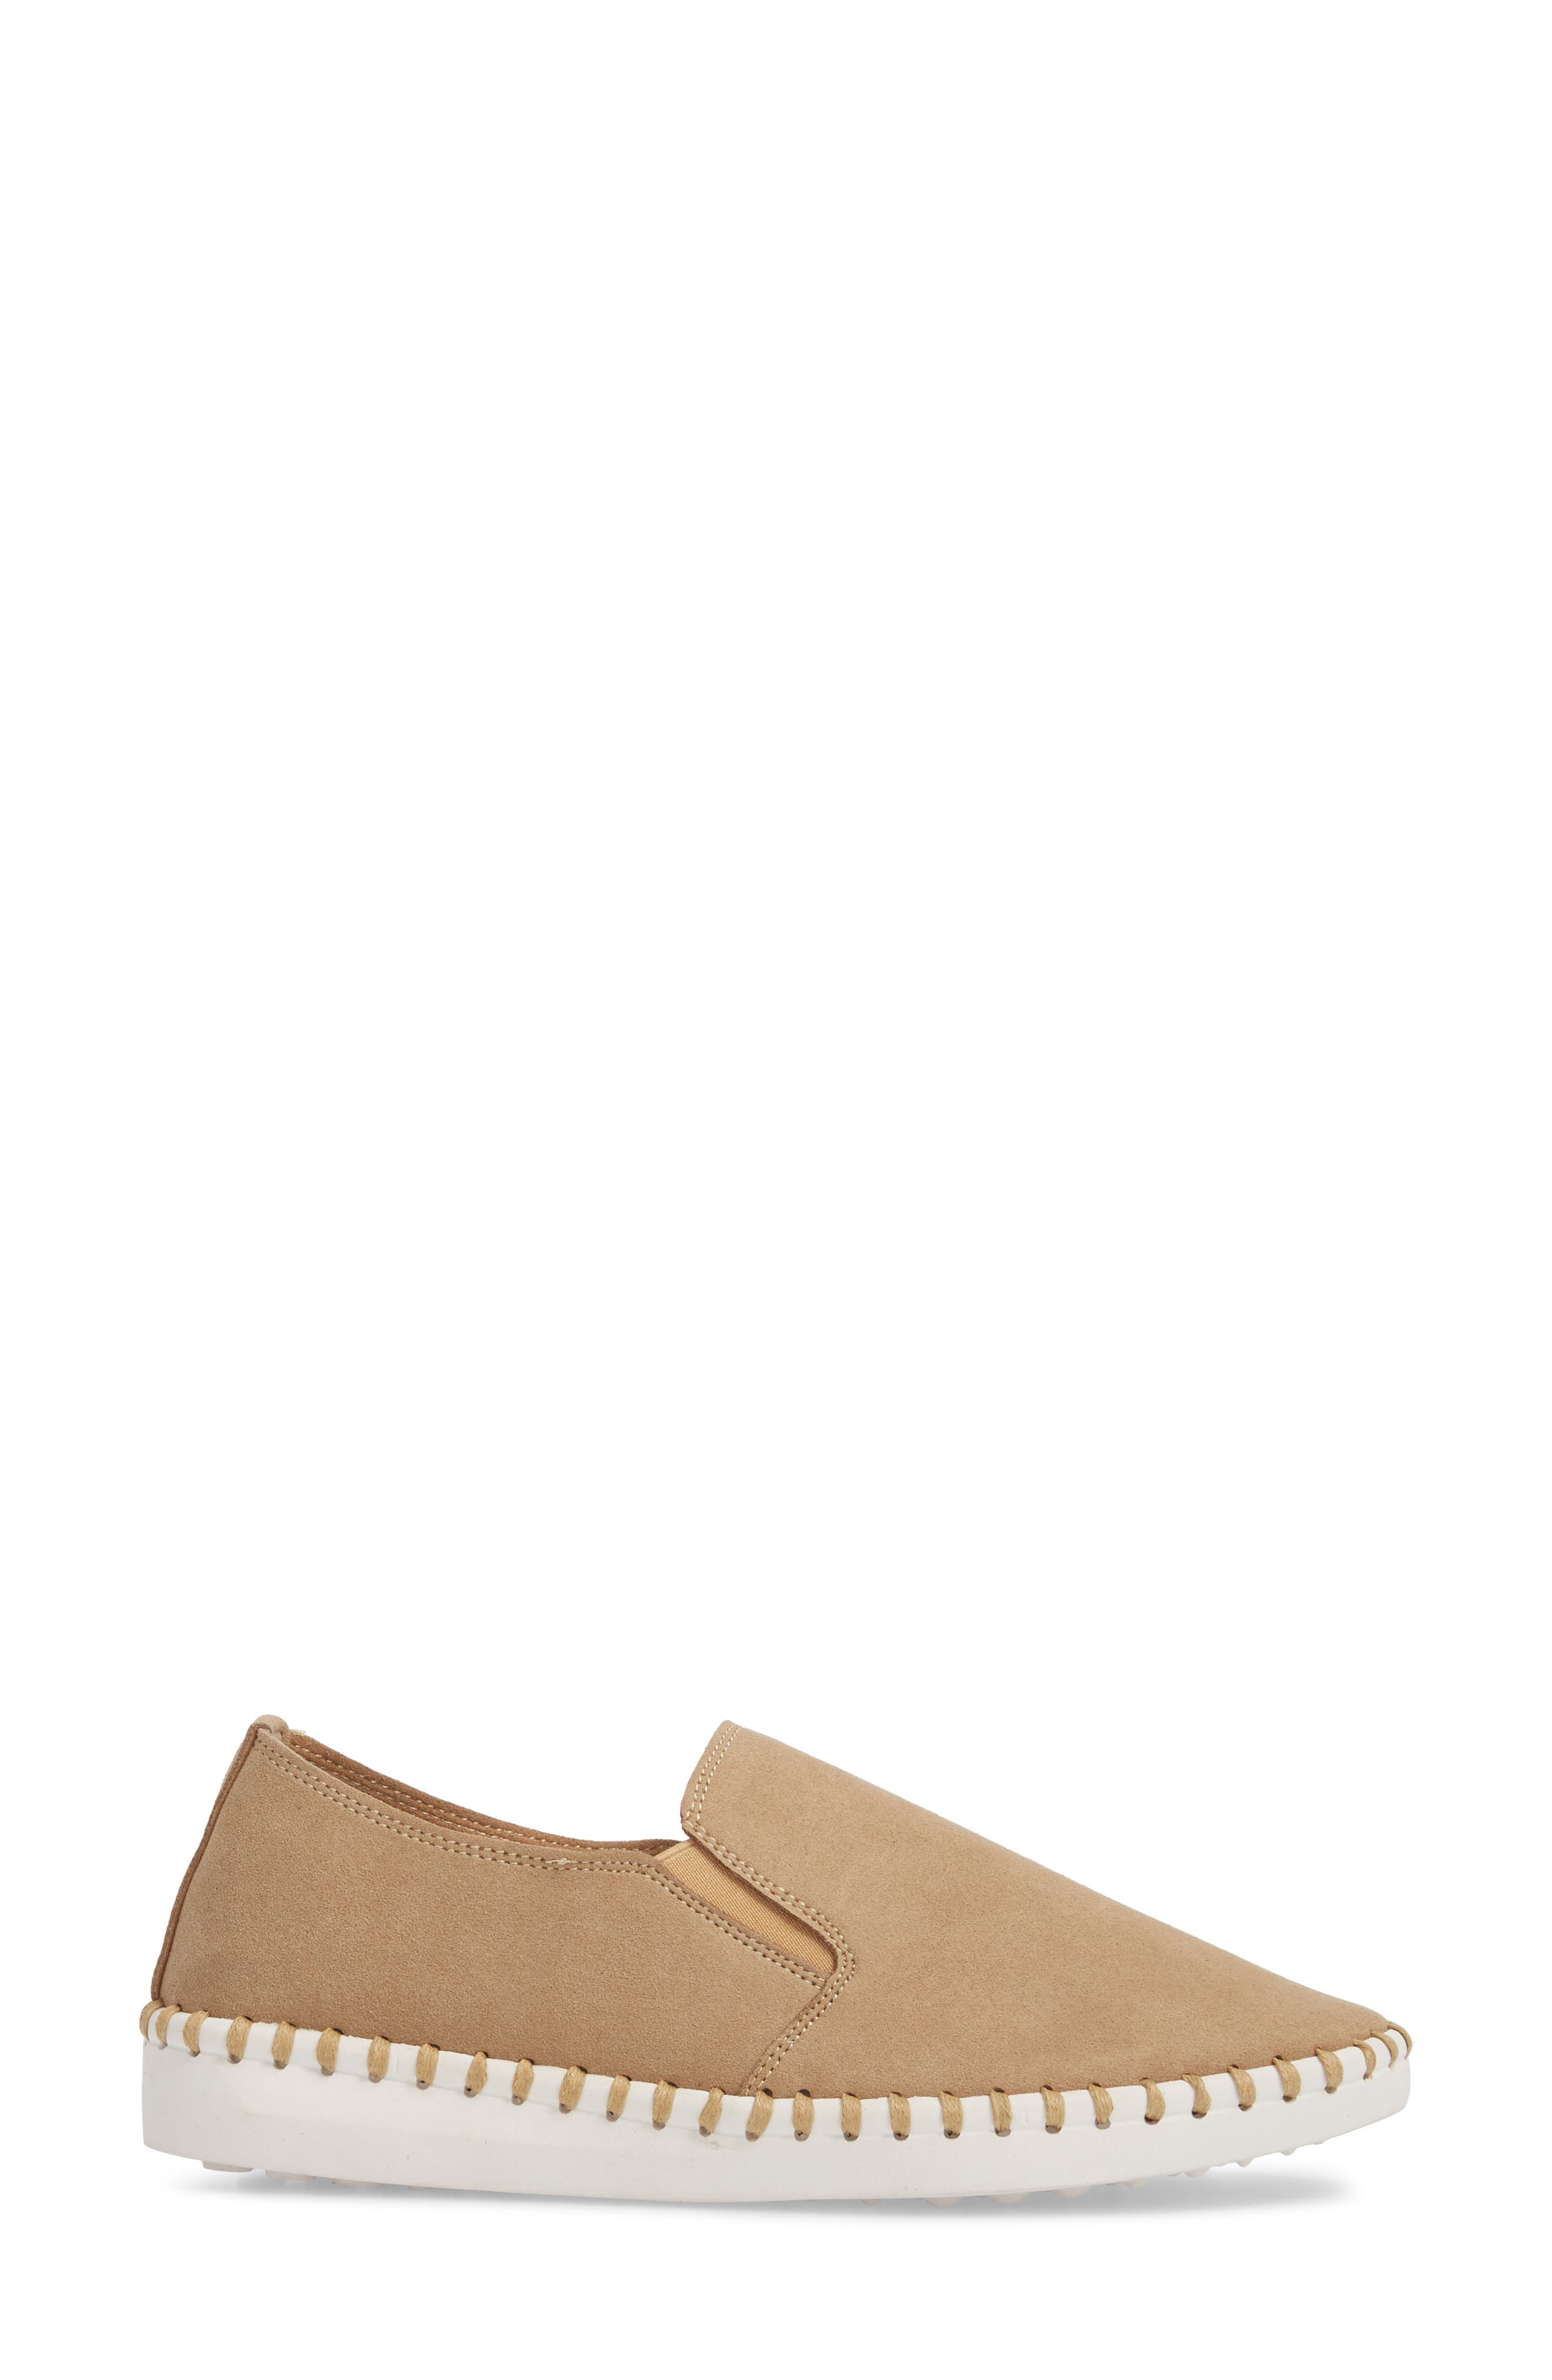 Salinas Waterproof Slip-On Sneaker,                             Alternate thumbnail 3, color,                             Tan Fabric